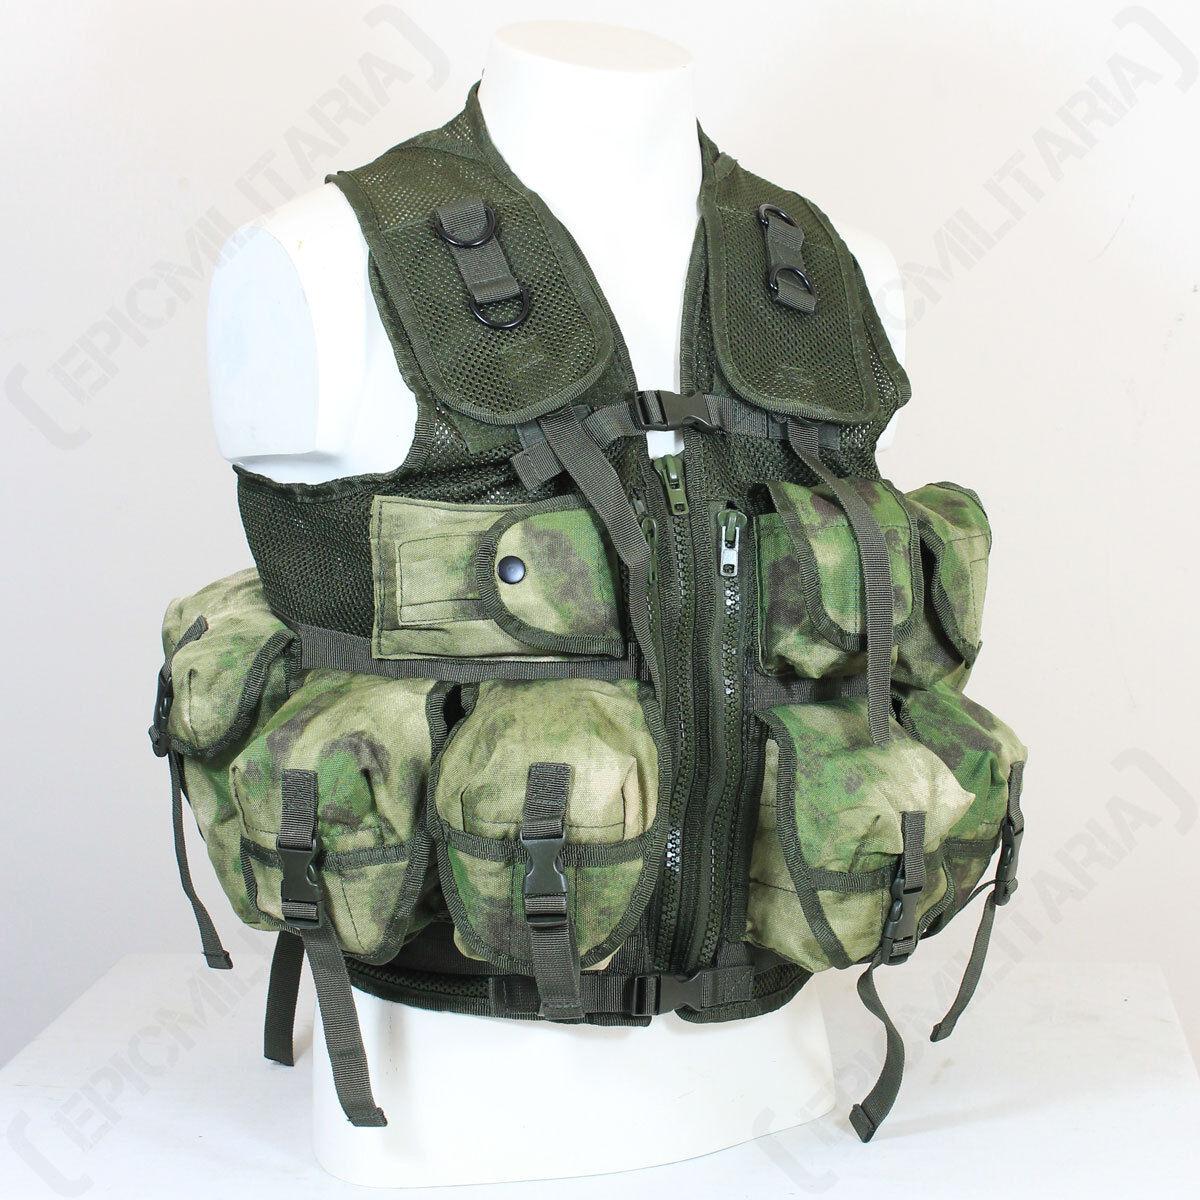 9 Poche Mil-Tacs FG Tactical Gilet - Assaut Combat Airsoft Paintball Cadets